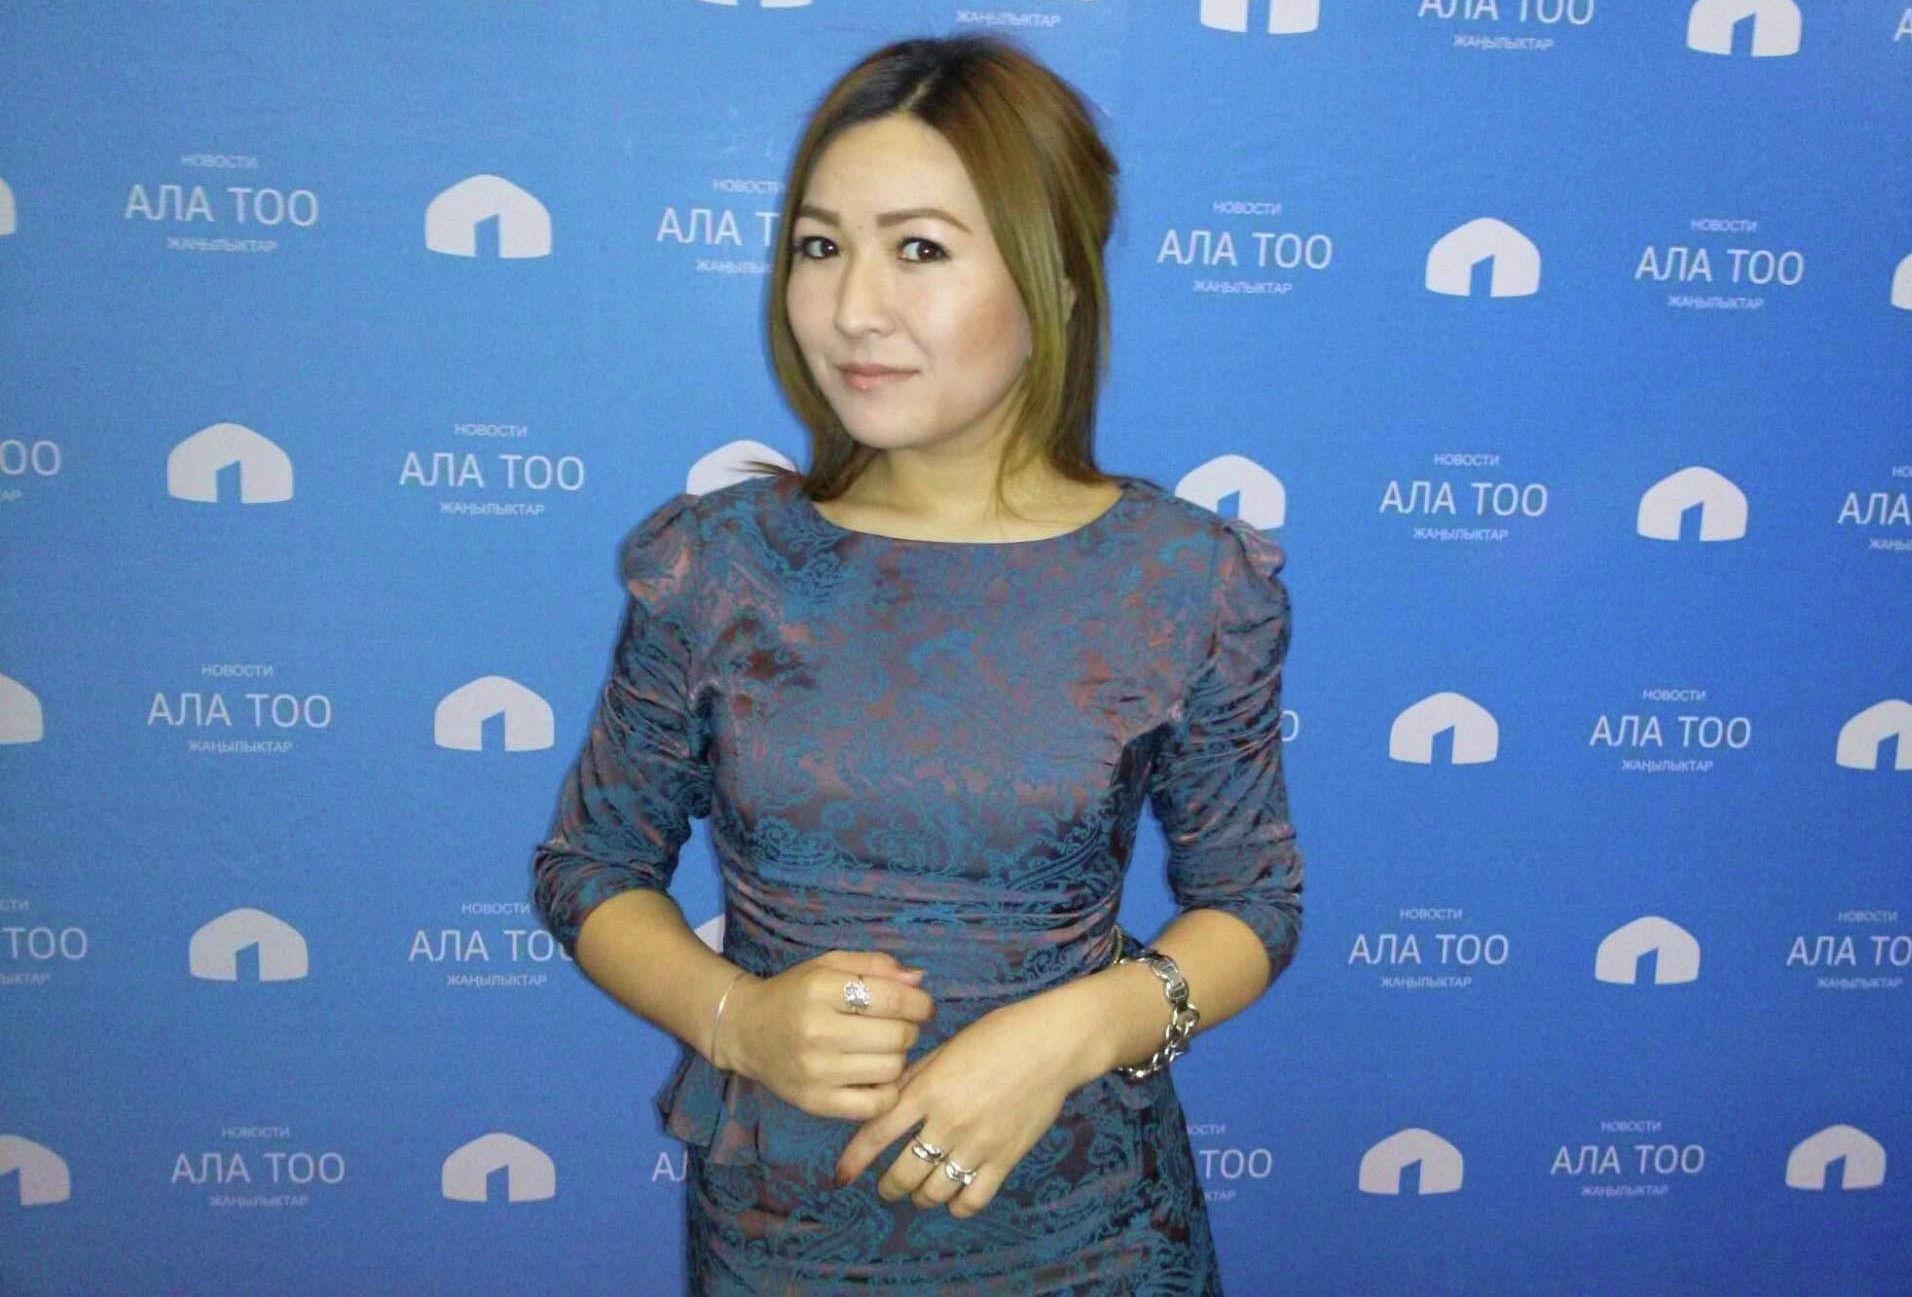 Журналист Жайнагул Тазабекова, работавшая в КТРК